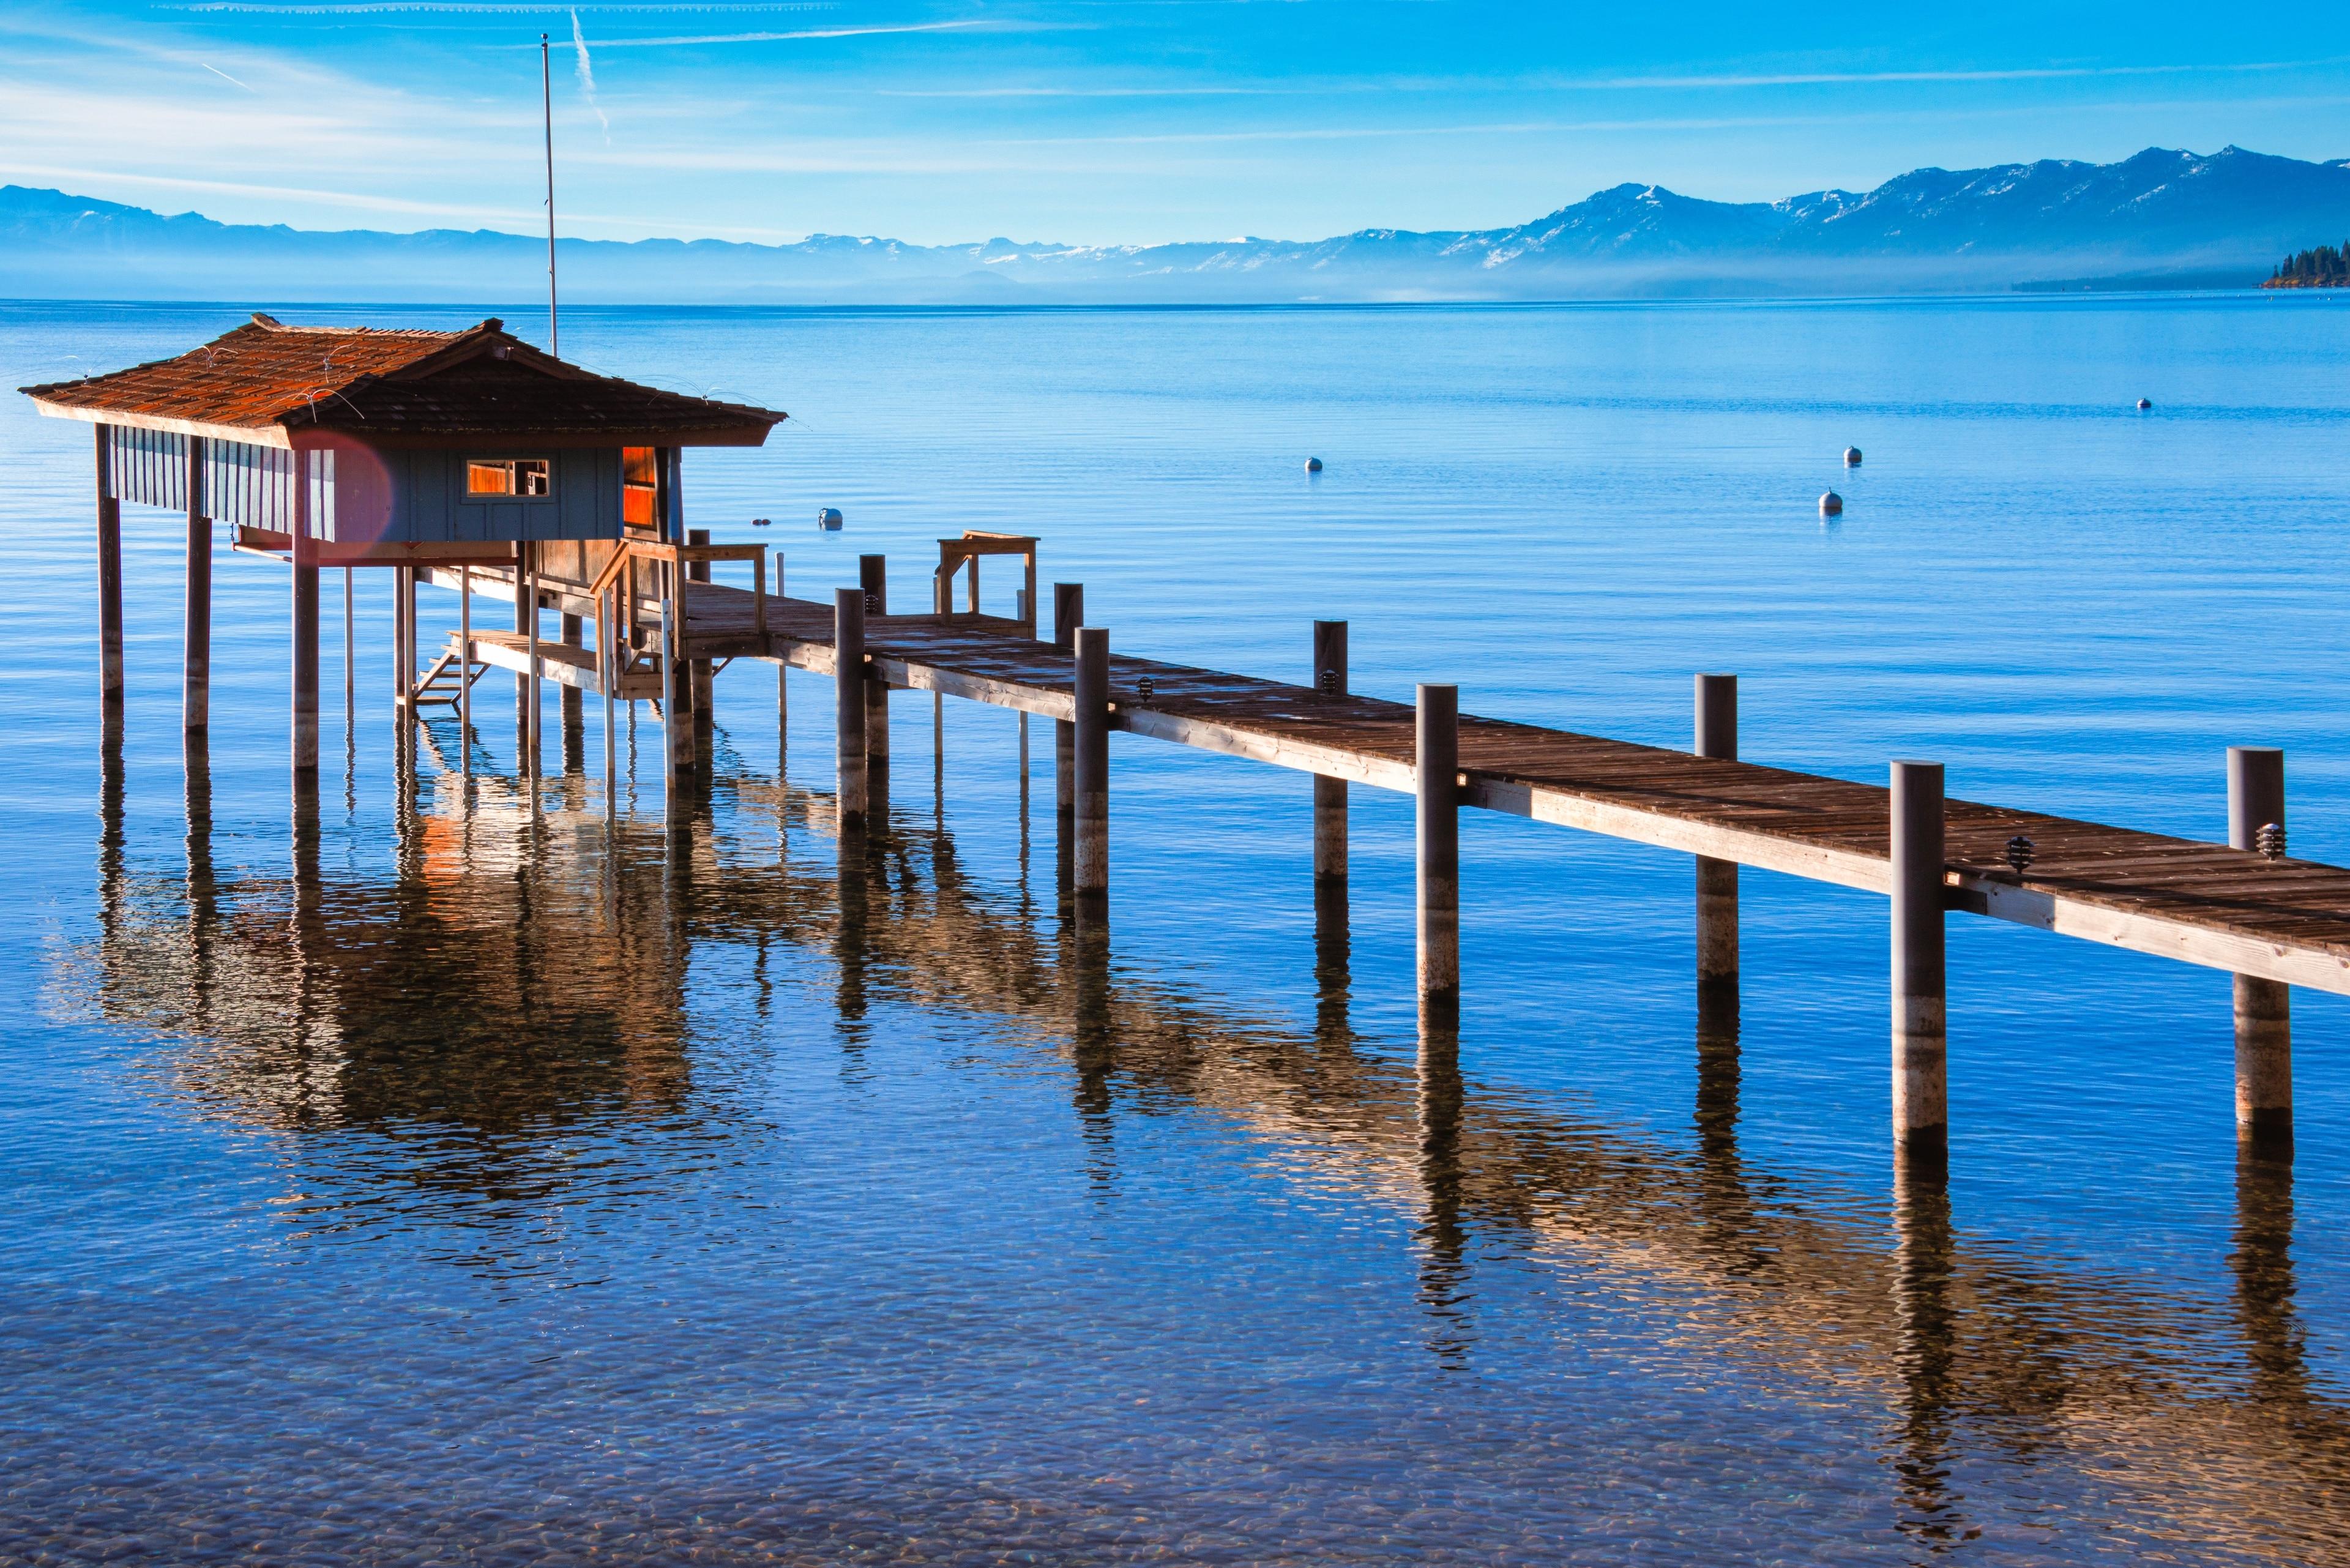 Carnelian Bay, California, United States of America